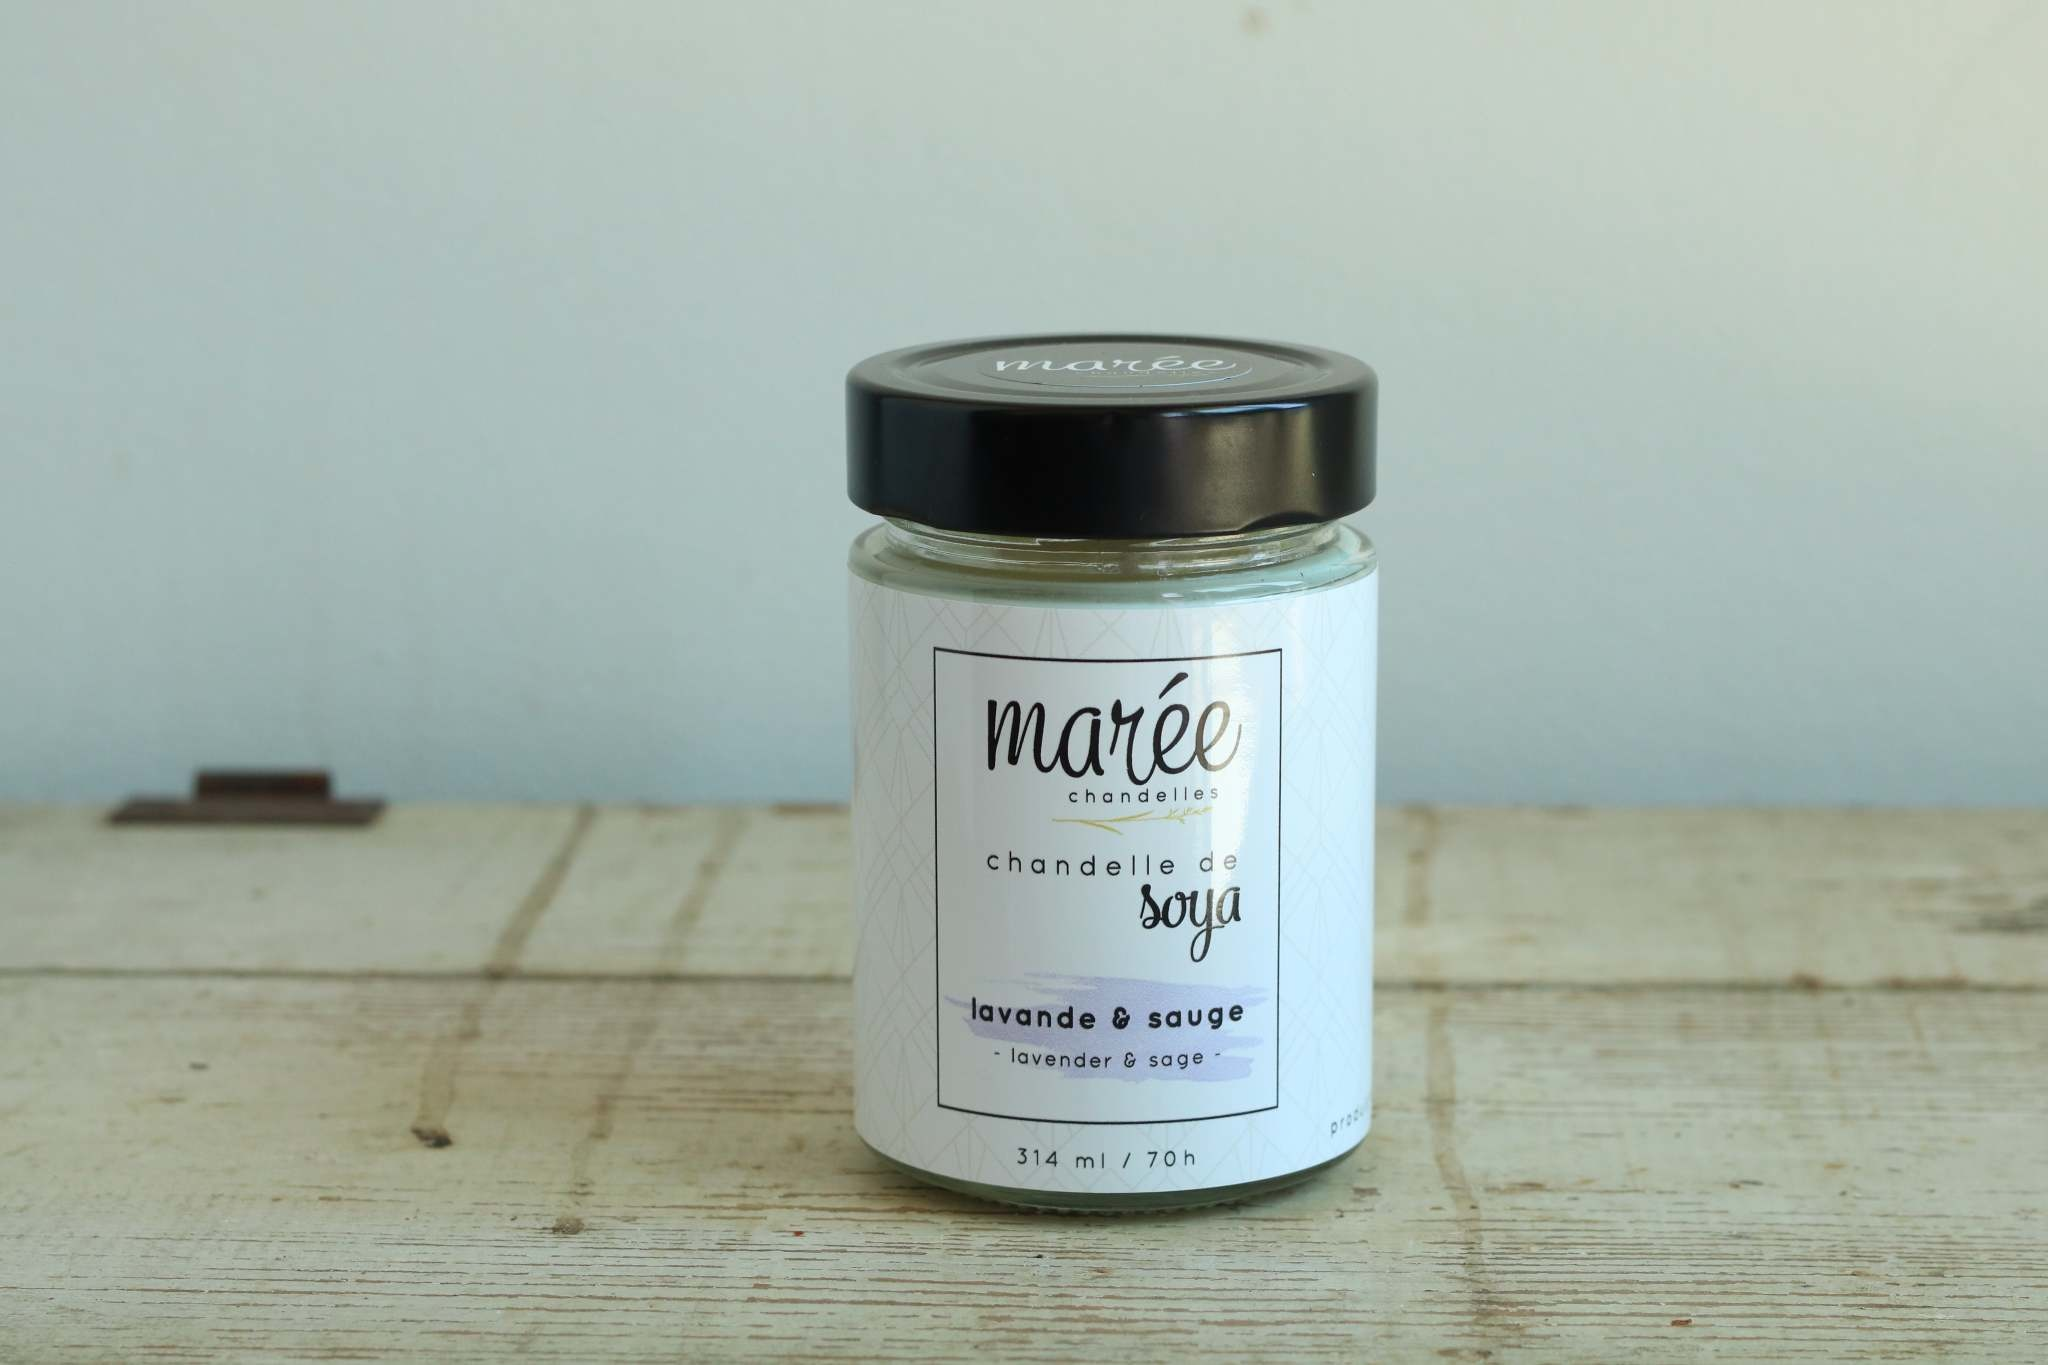 Marée chandelles MARÉE CHANDELLES: Chandelle de soya lavande & sauge (314ml)